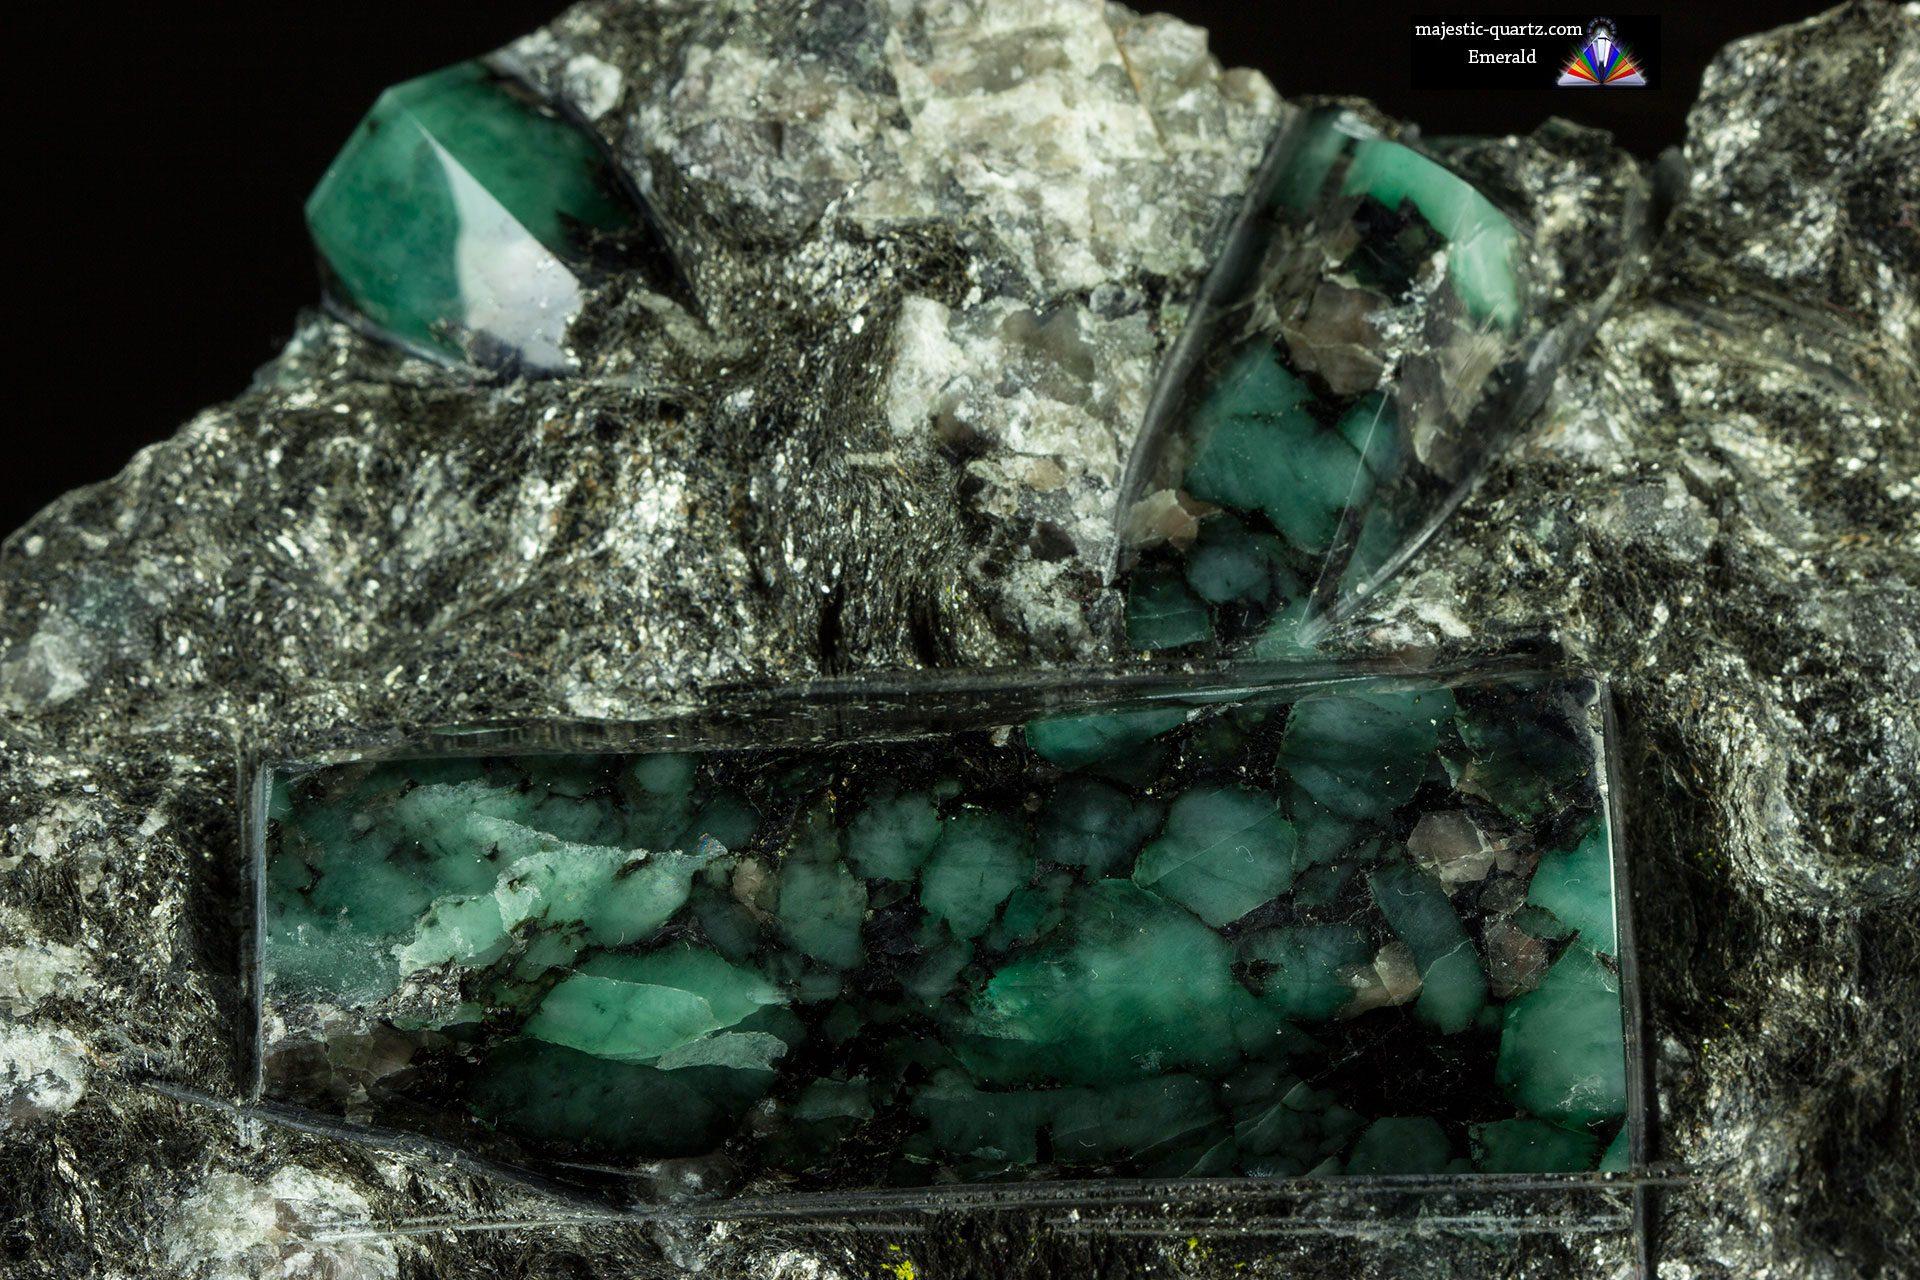 Polished Emerald on Matrix Crystal Specimen - Photograph by Anthony Bradford